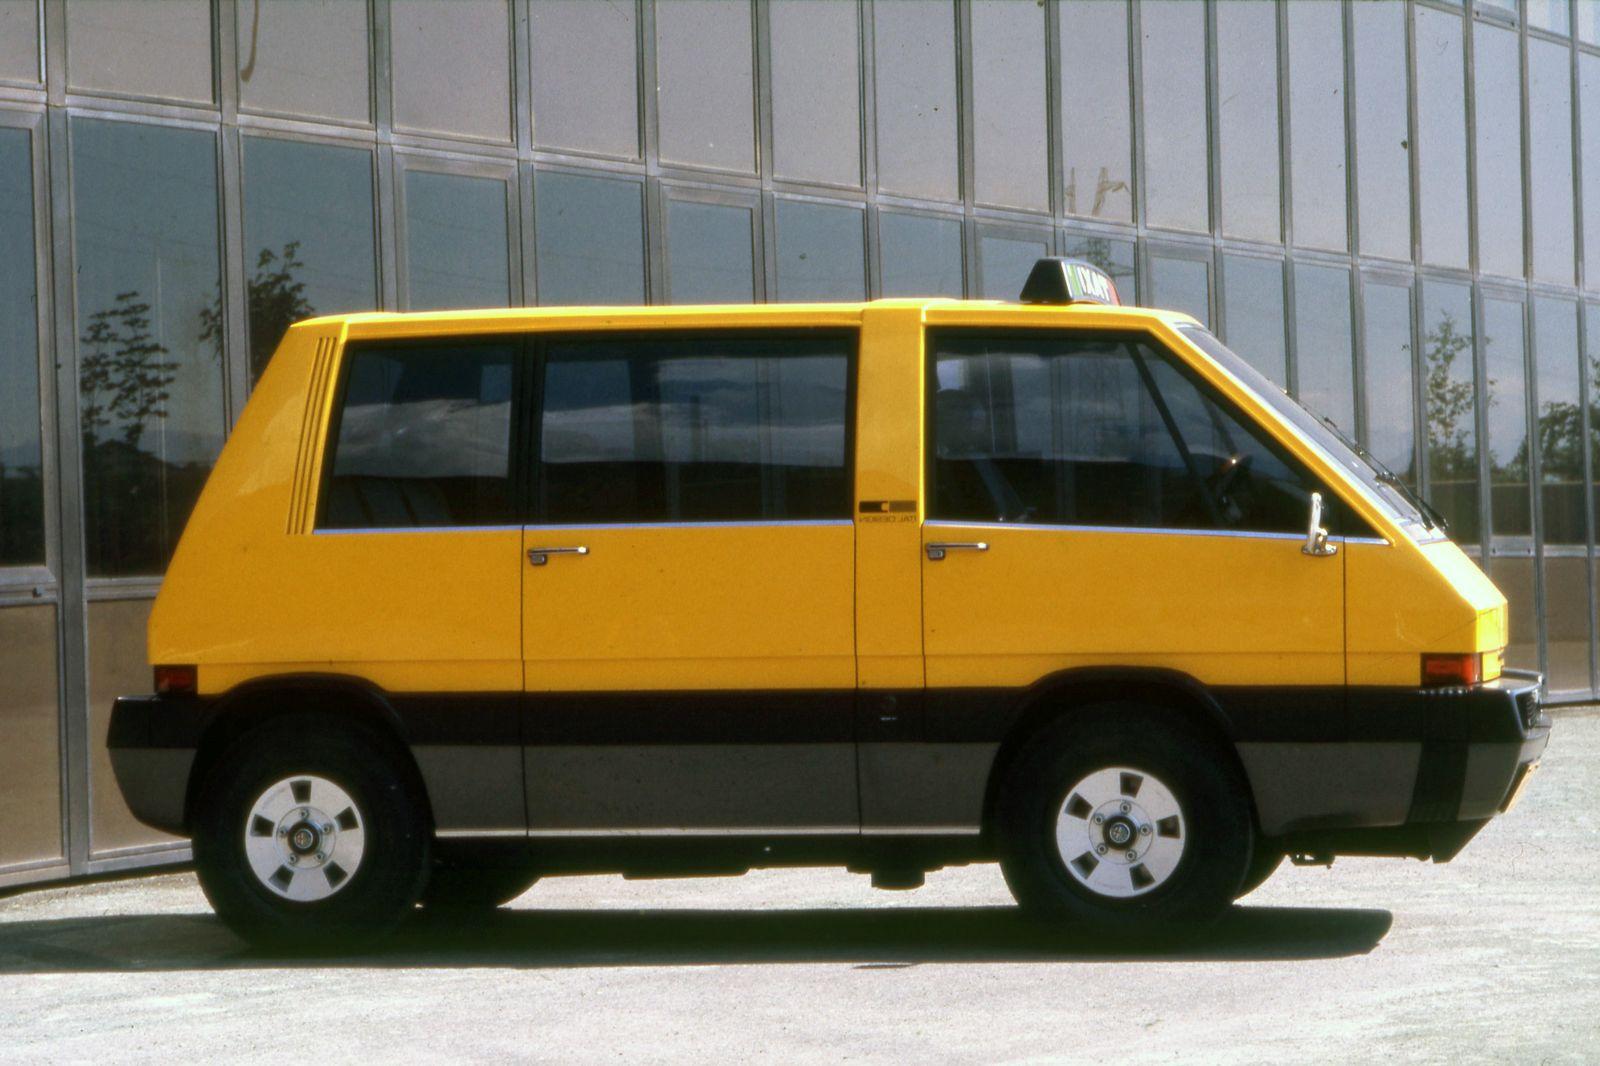 Schönes Ding / Alfa Romeo New York Taxi (von Giugiaro), 1976